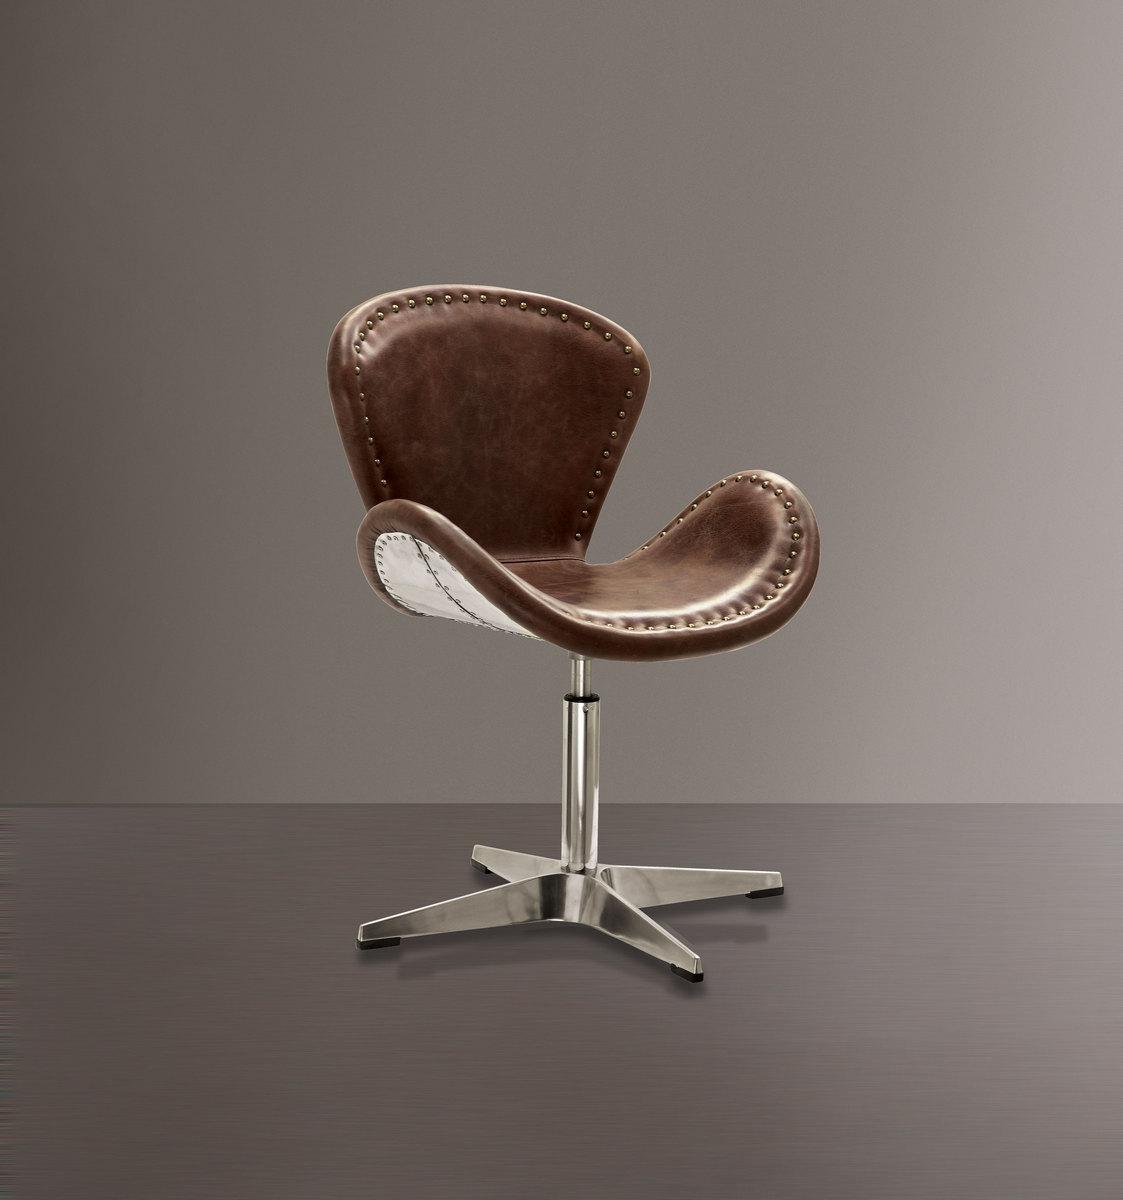 Acme Accent Chair Swivel Retro Brown Top Grain Leather Aluminum